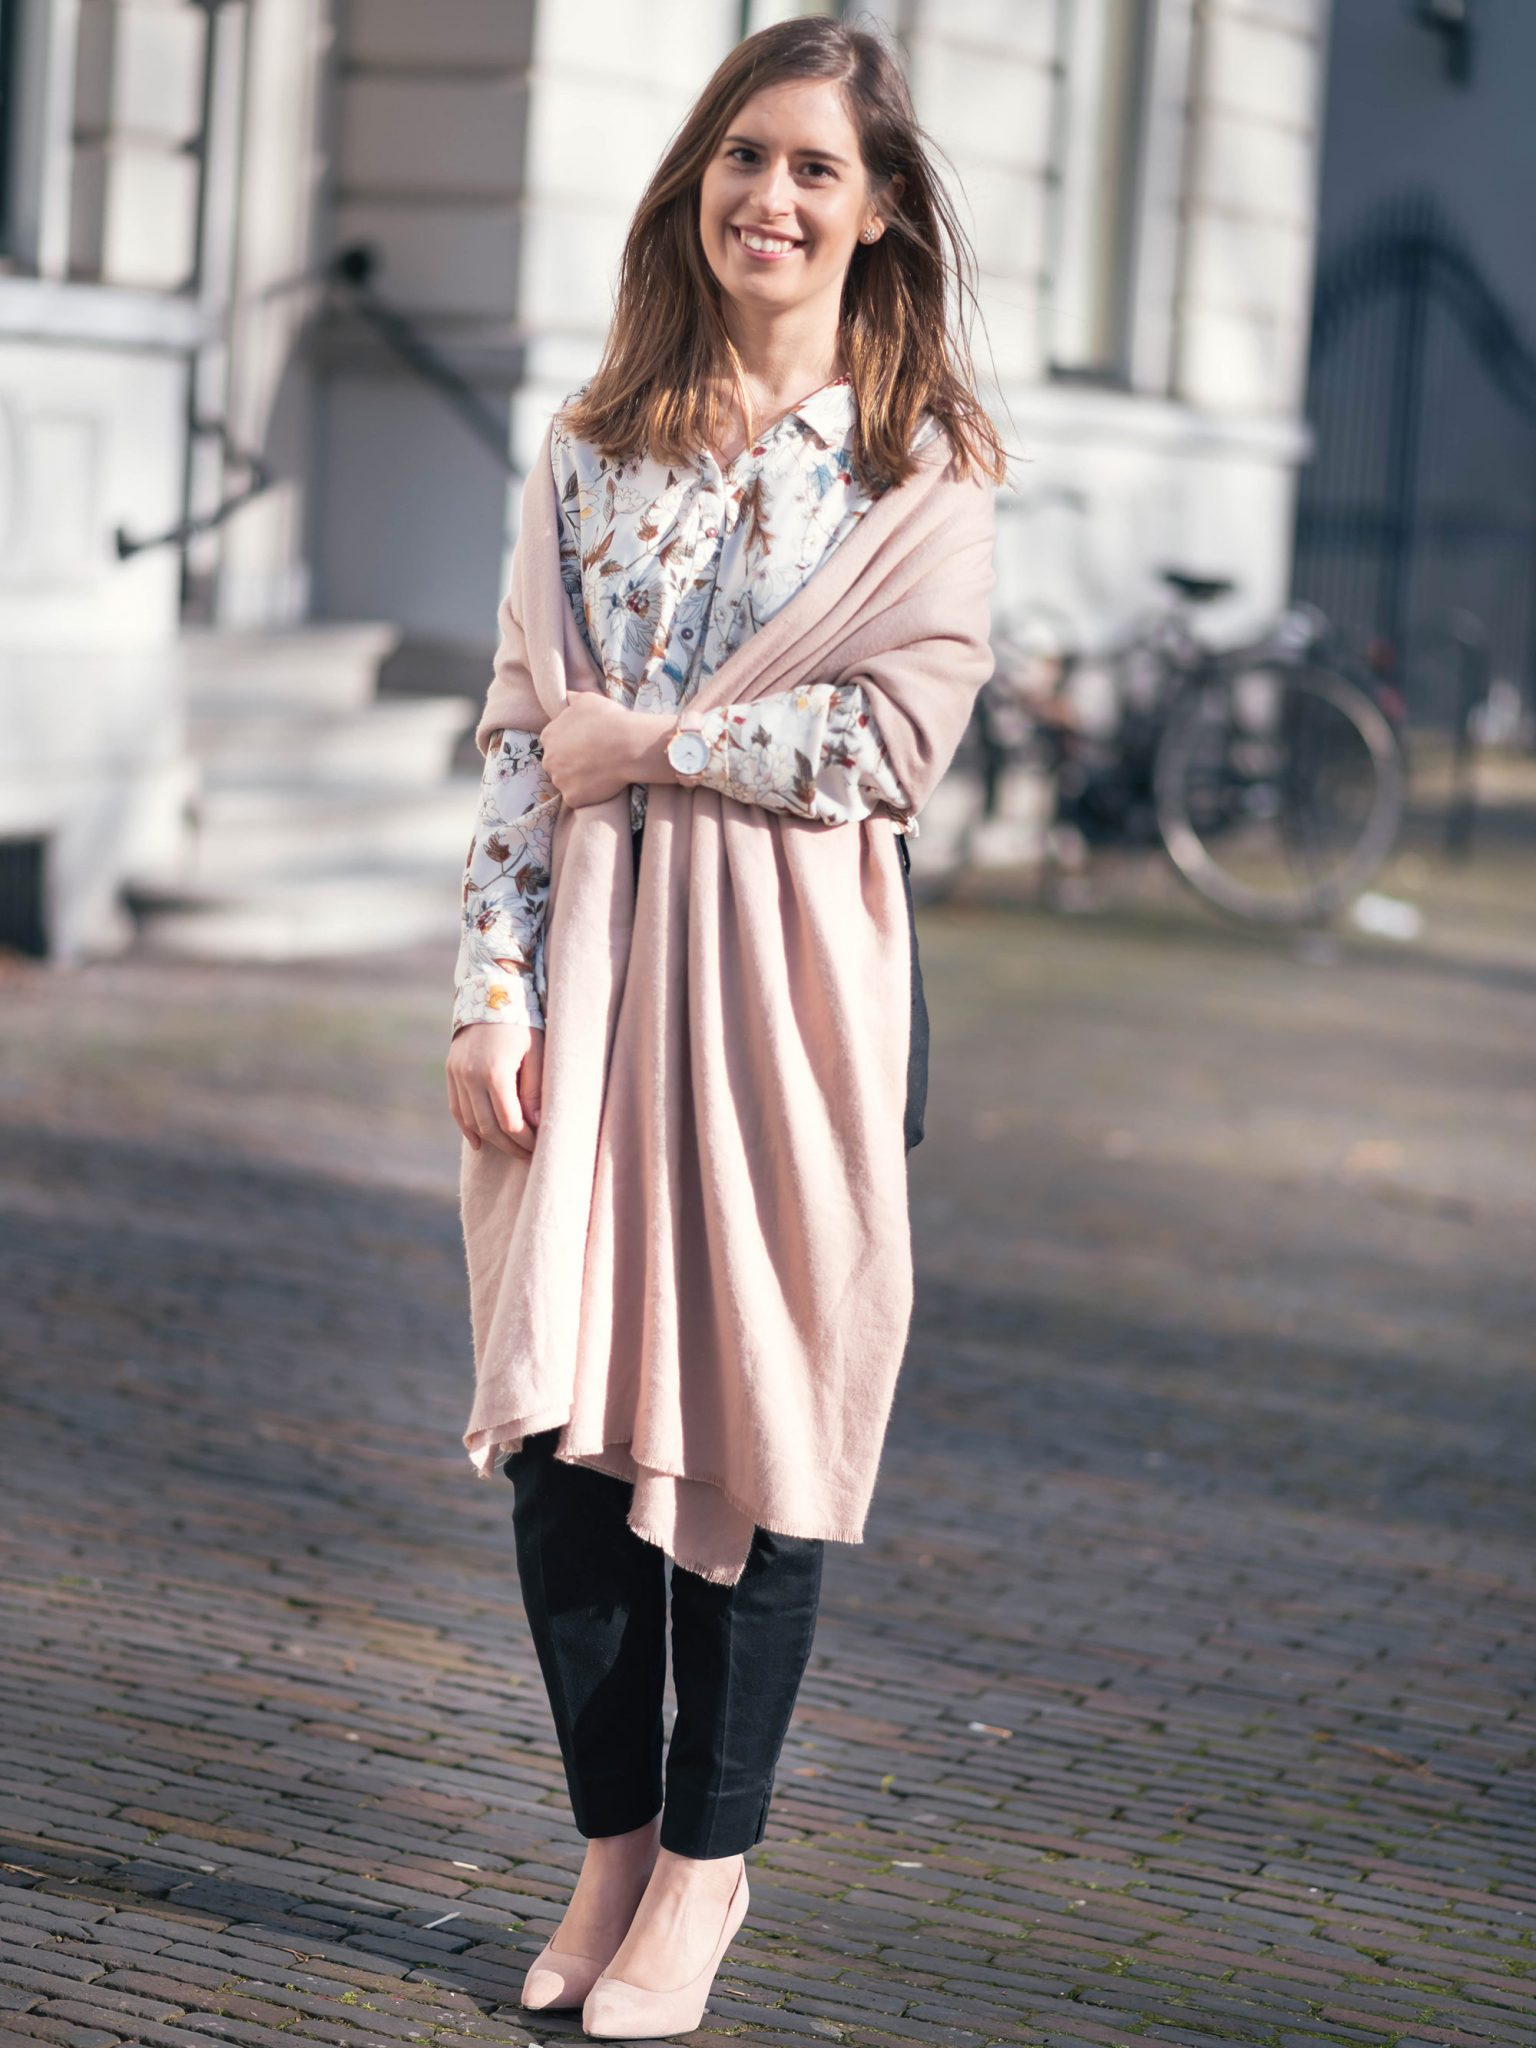 thepetitecat-blush-shades-outfit-inspiration